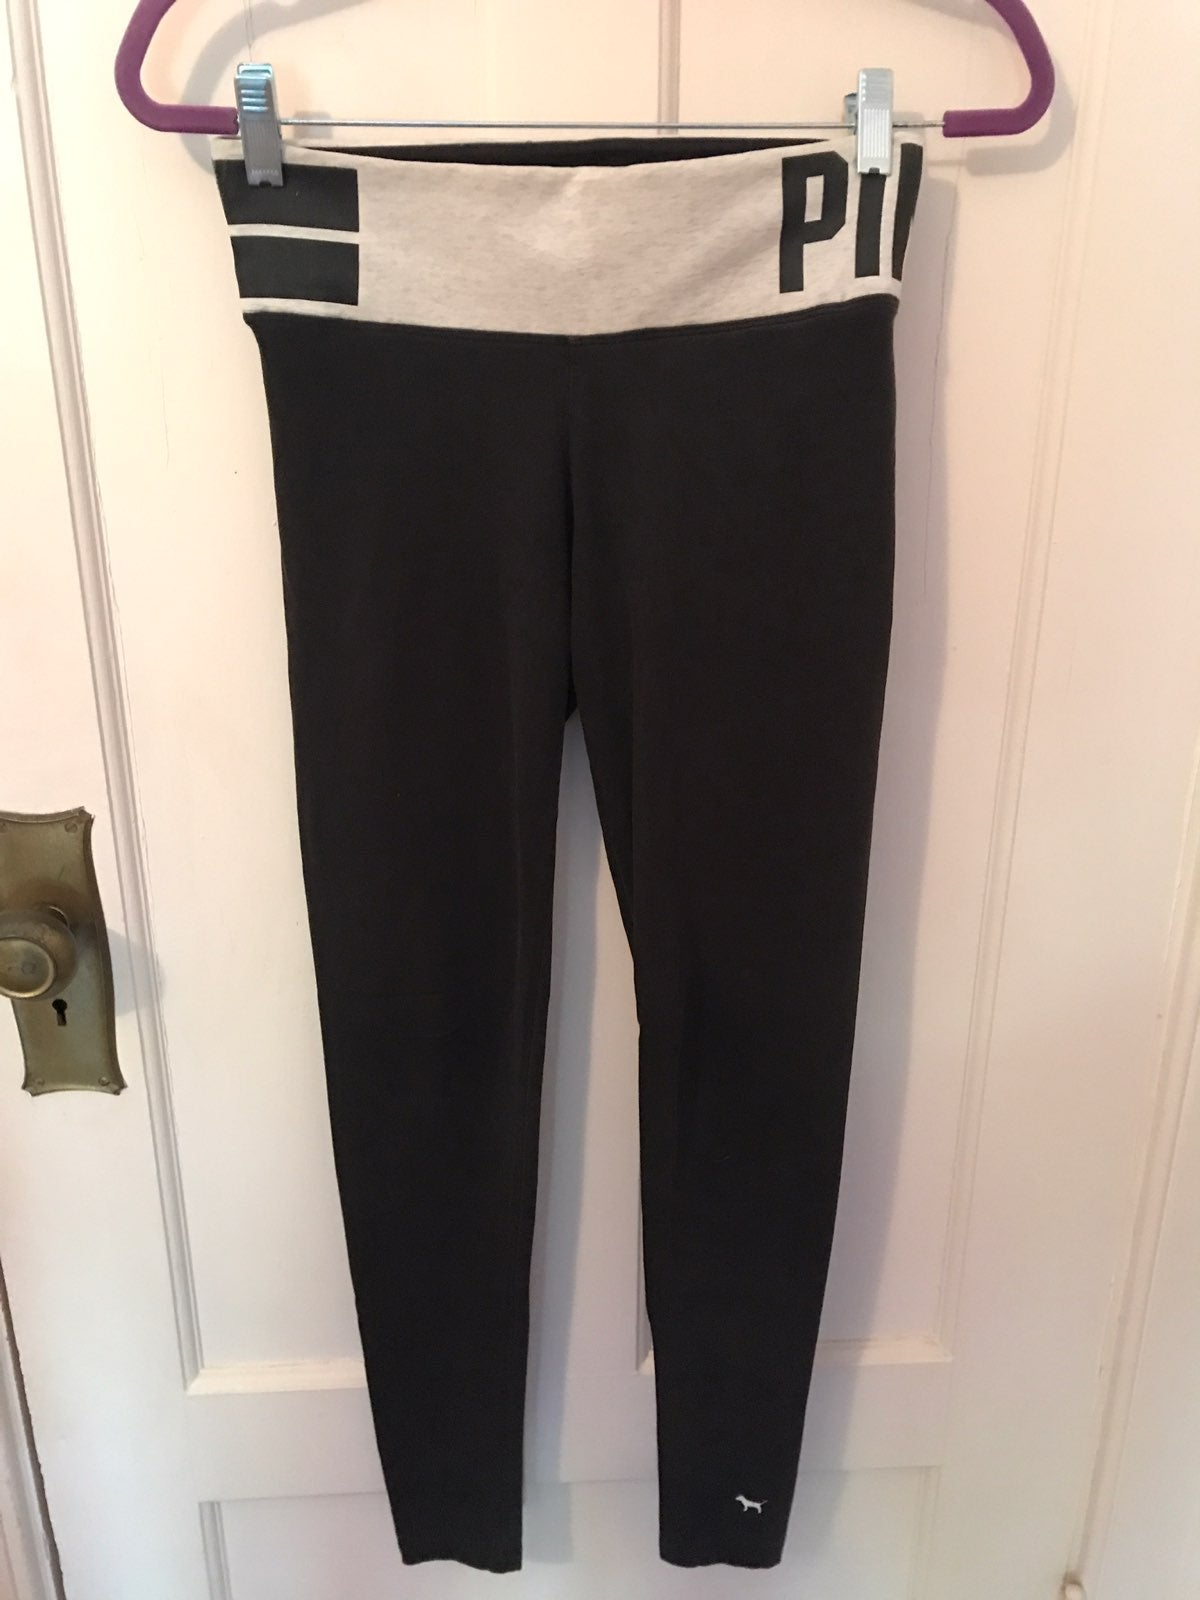 Yoga leggings by Pink, xs